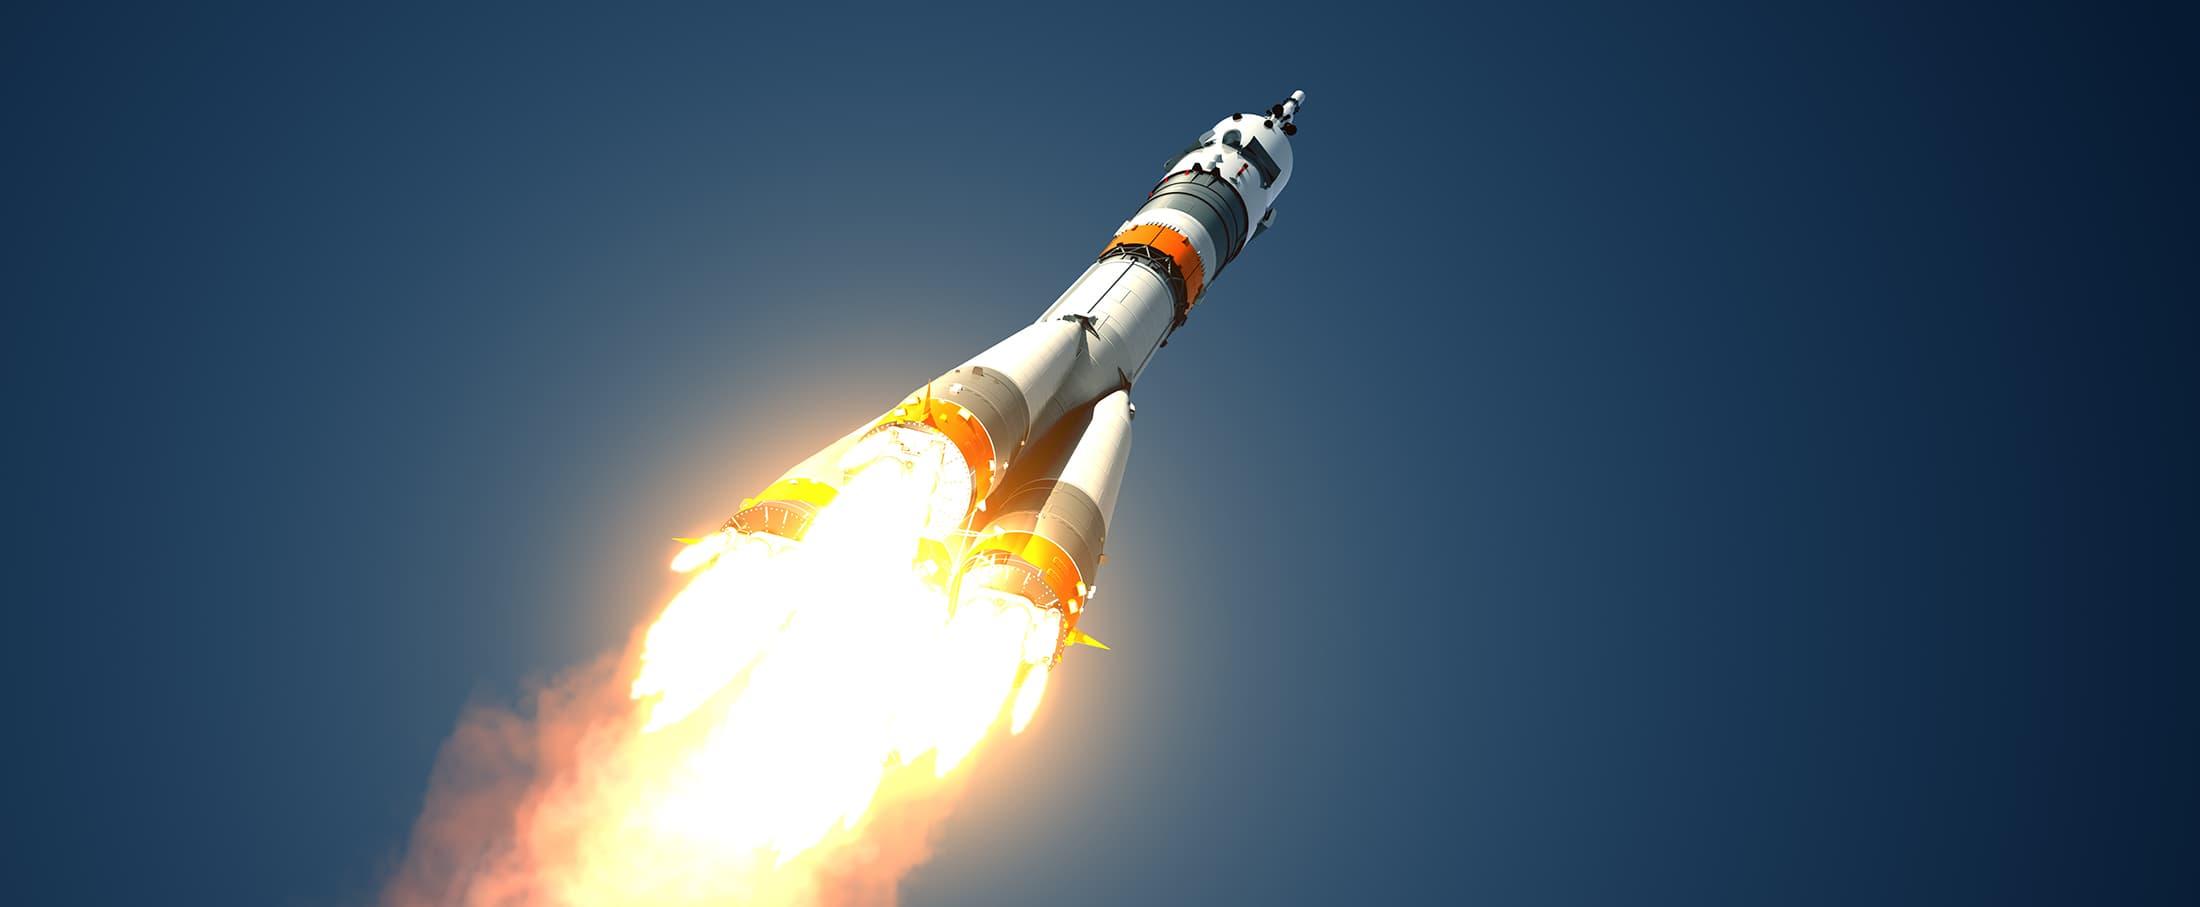 rakieta tło